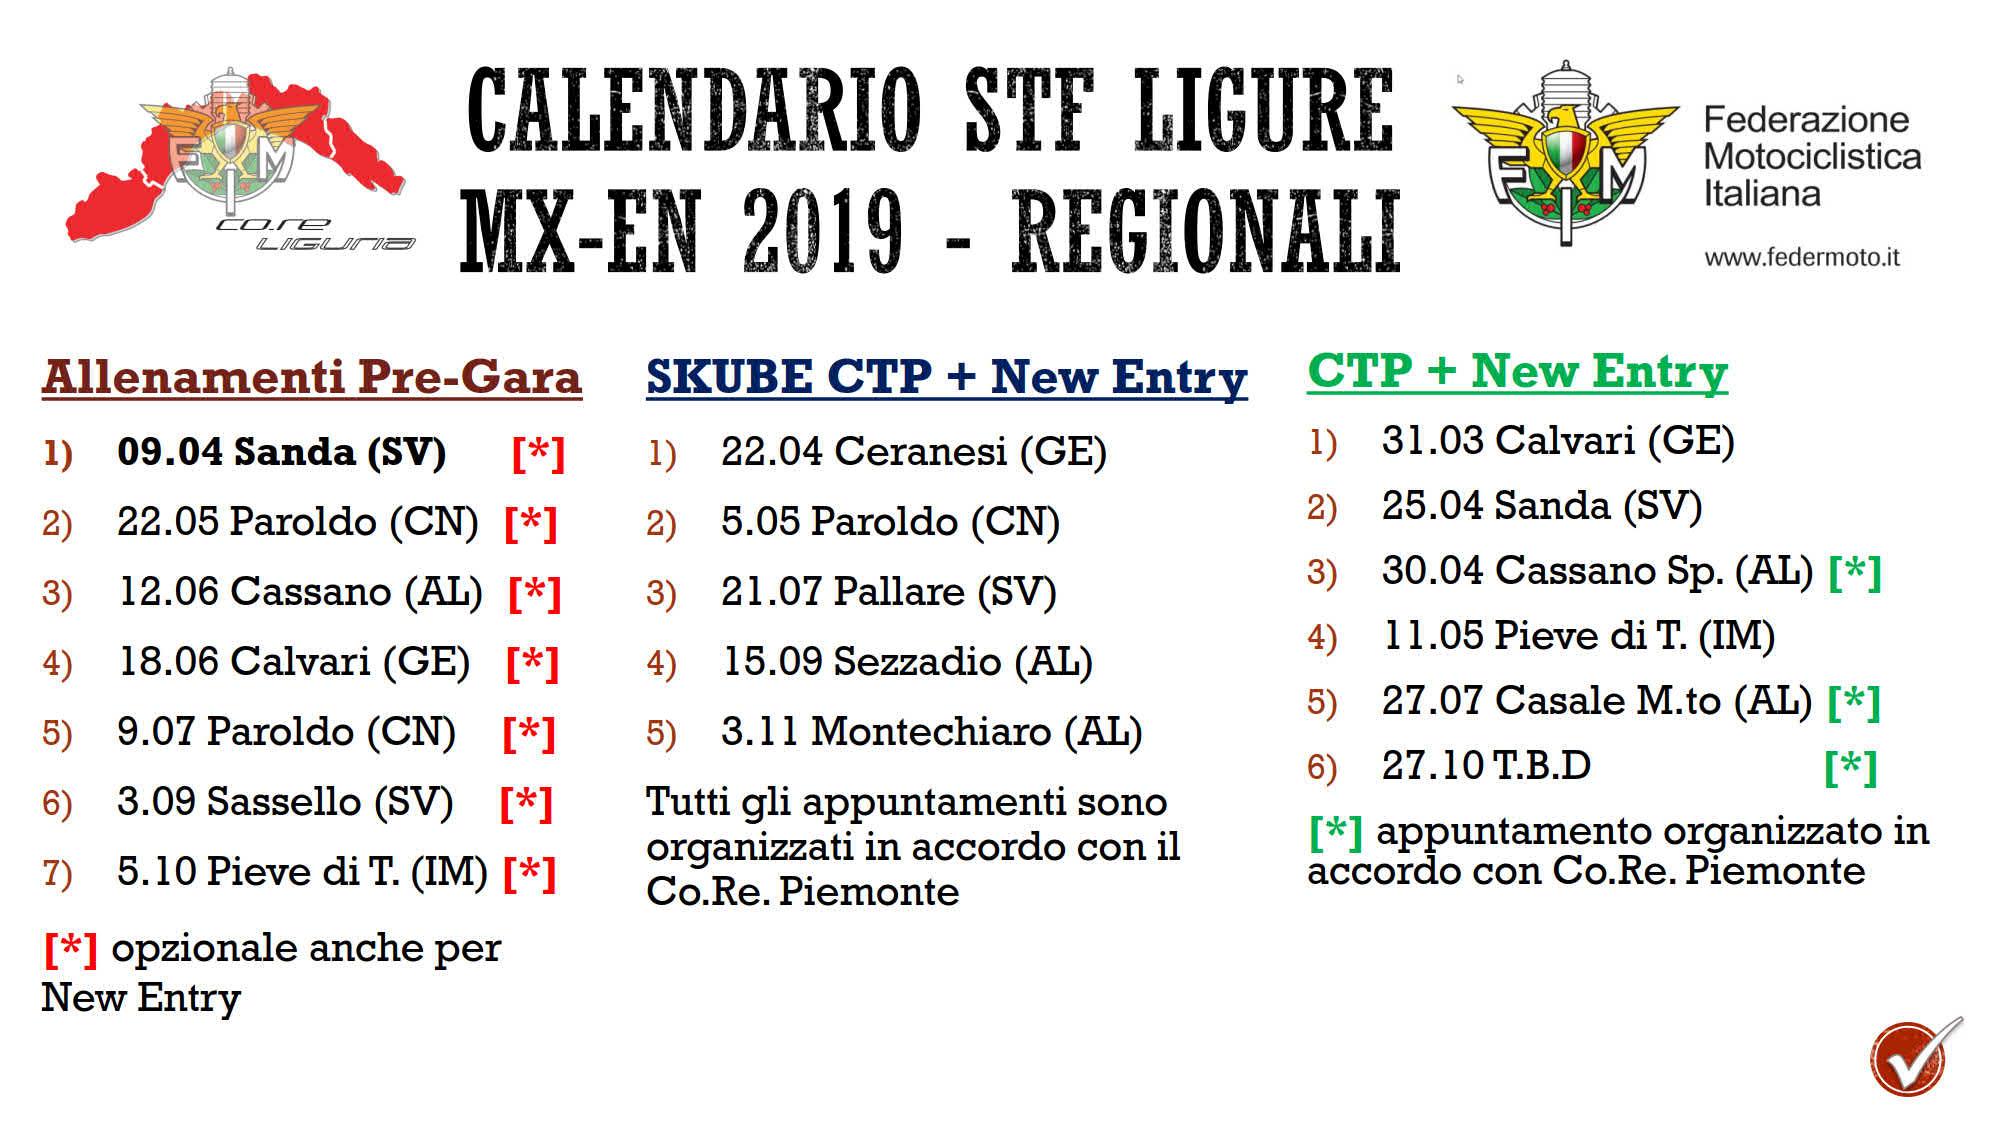 Calendario Regionale Liguria.Calendario Stf R Ligure 2019 V2 1 Small Fmi Comitato